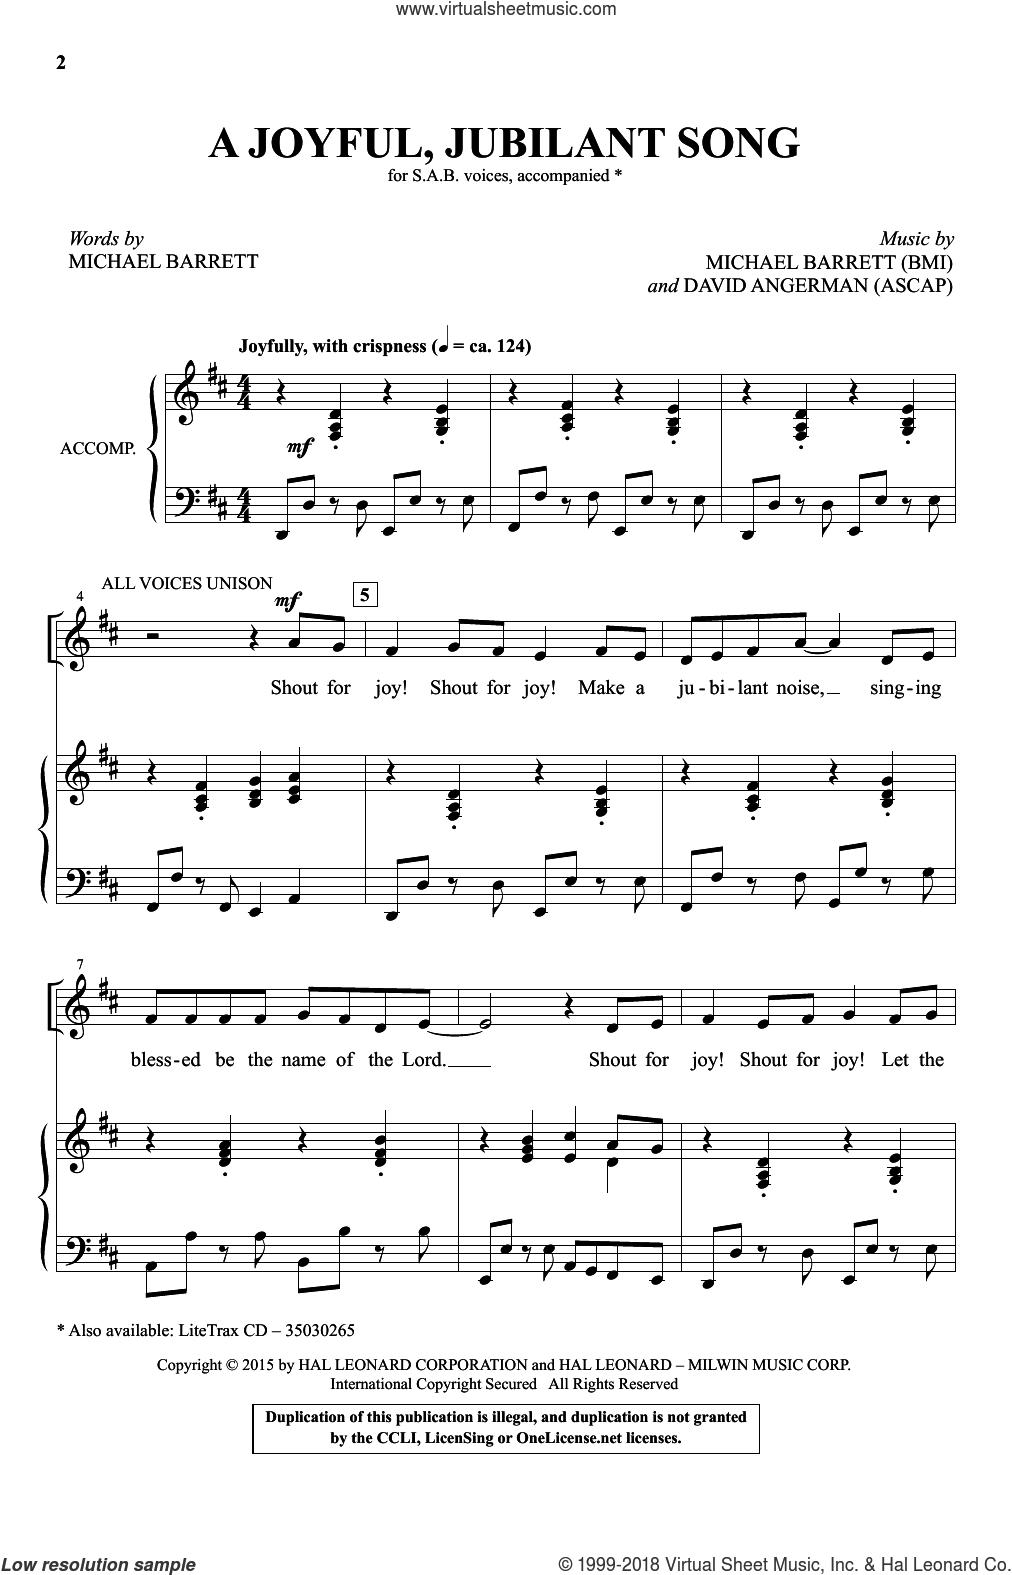 A Joyful, Jubilant Song sheet music for choir (SAB: soprano, alto, bass) by Michael Barrett and David Angerman, intermediate skill level